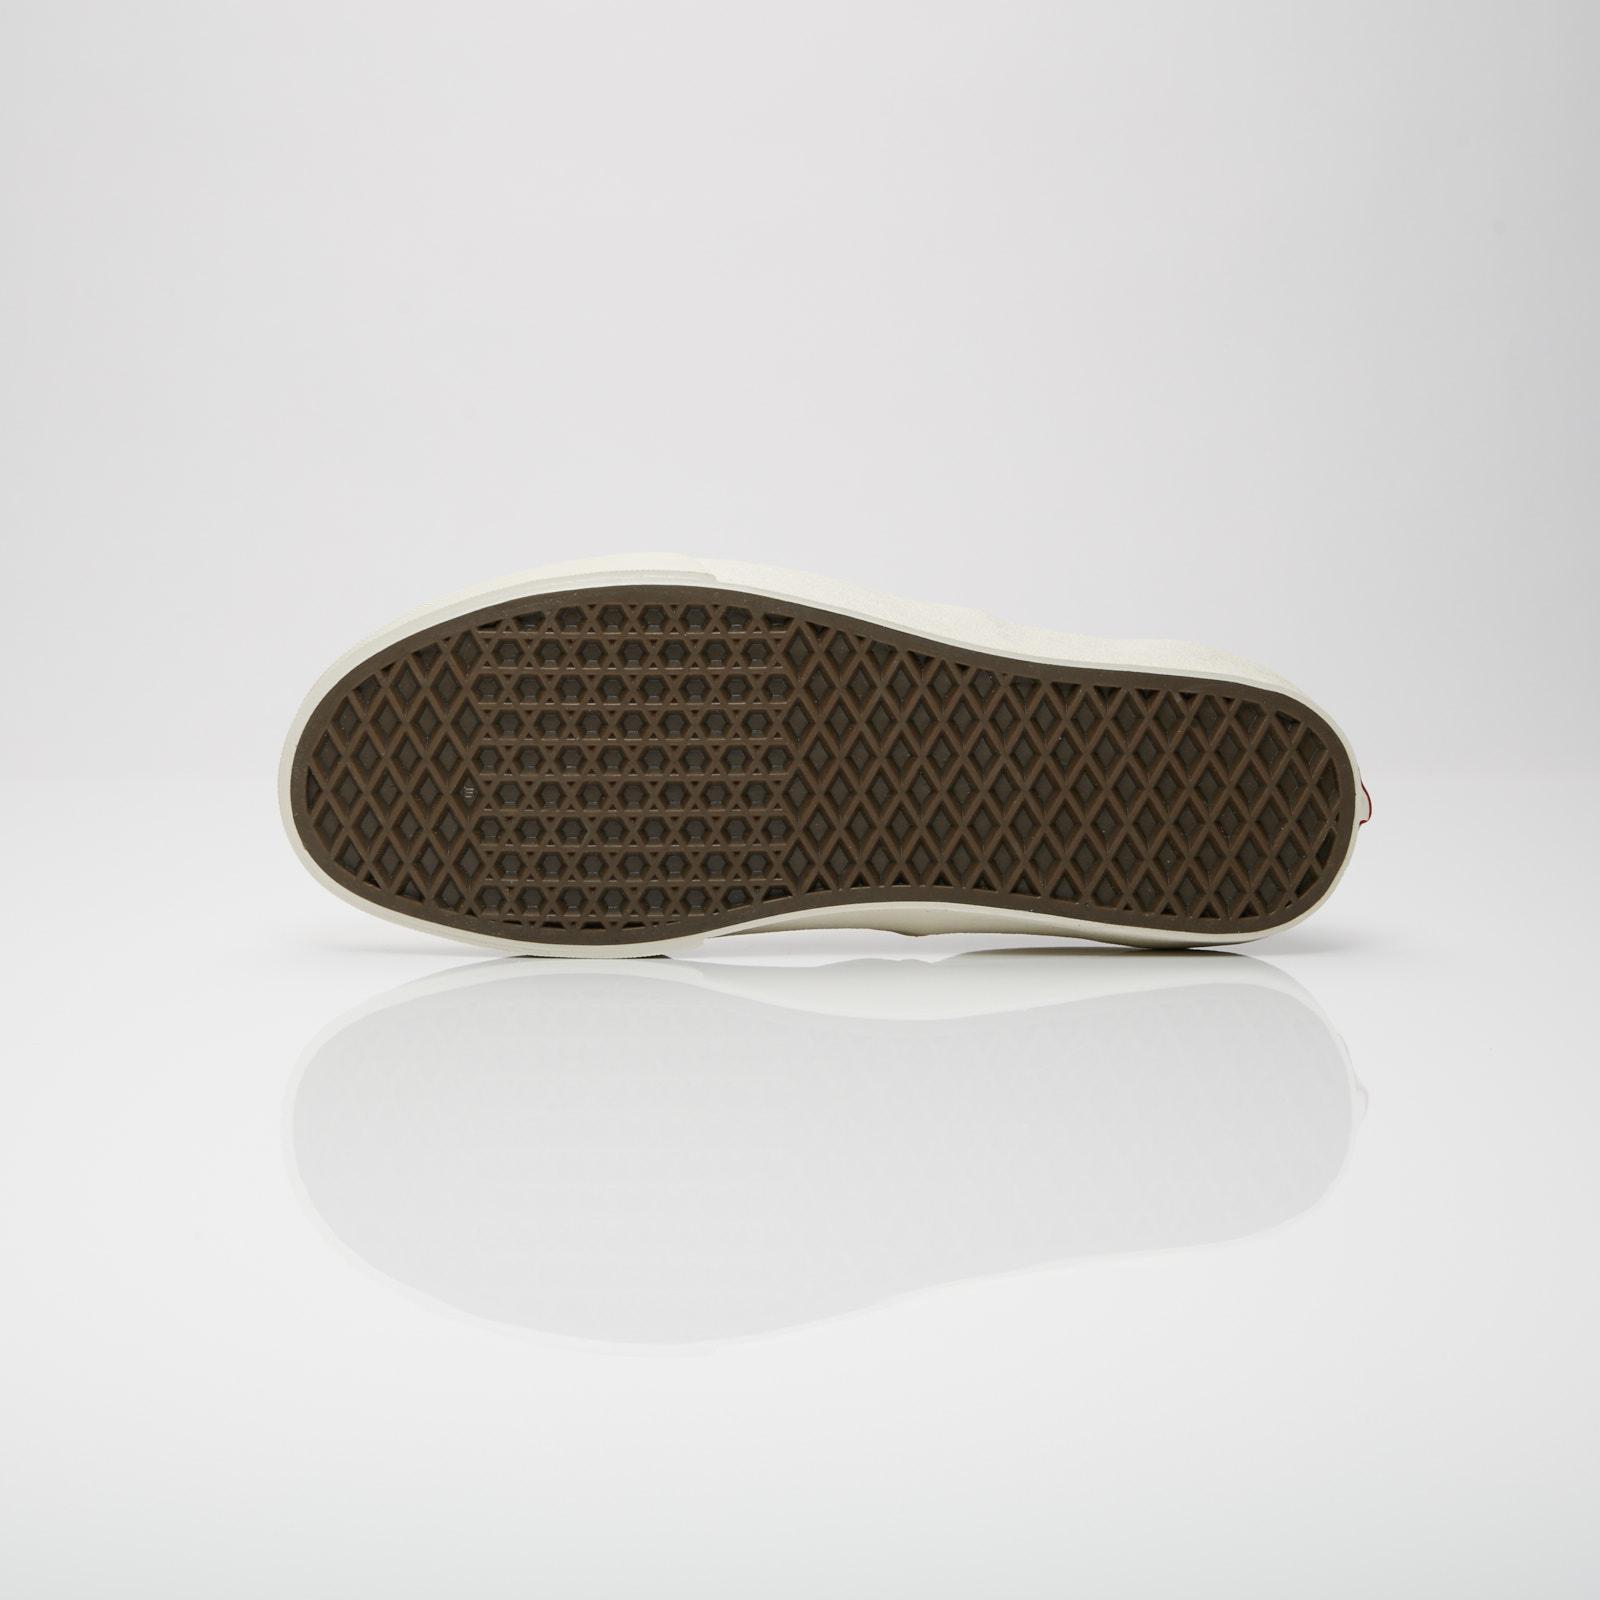 f650fbe620 Vans UA Classic Slip-On DX - Va38f8qf9 - Sneakersnstuff